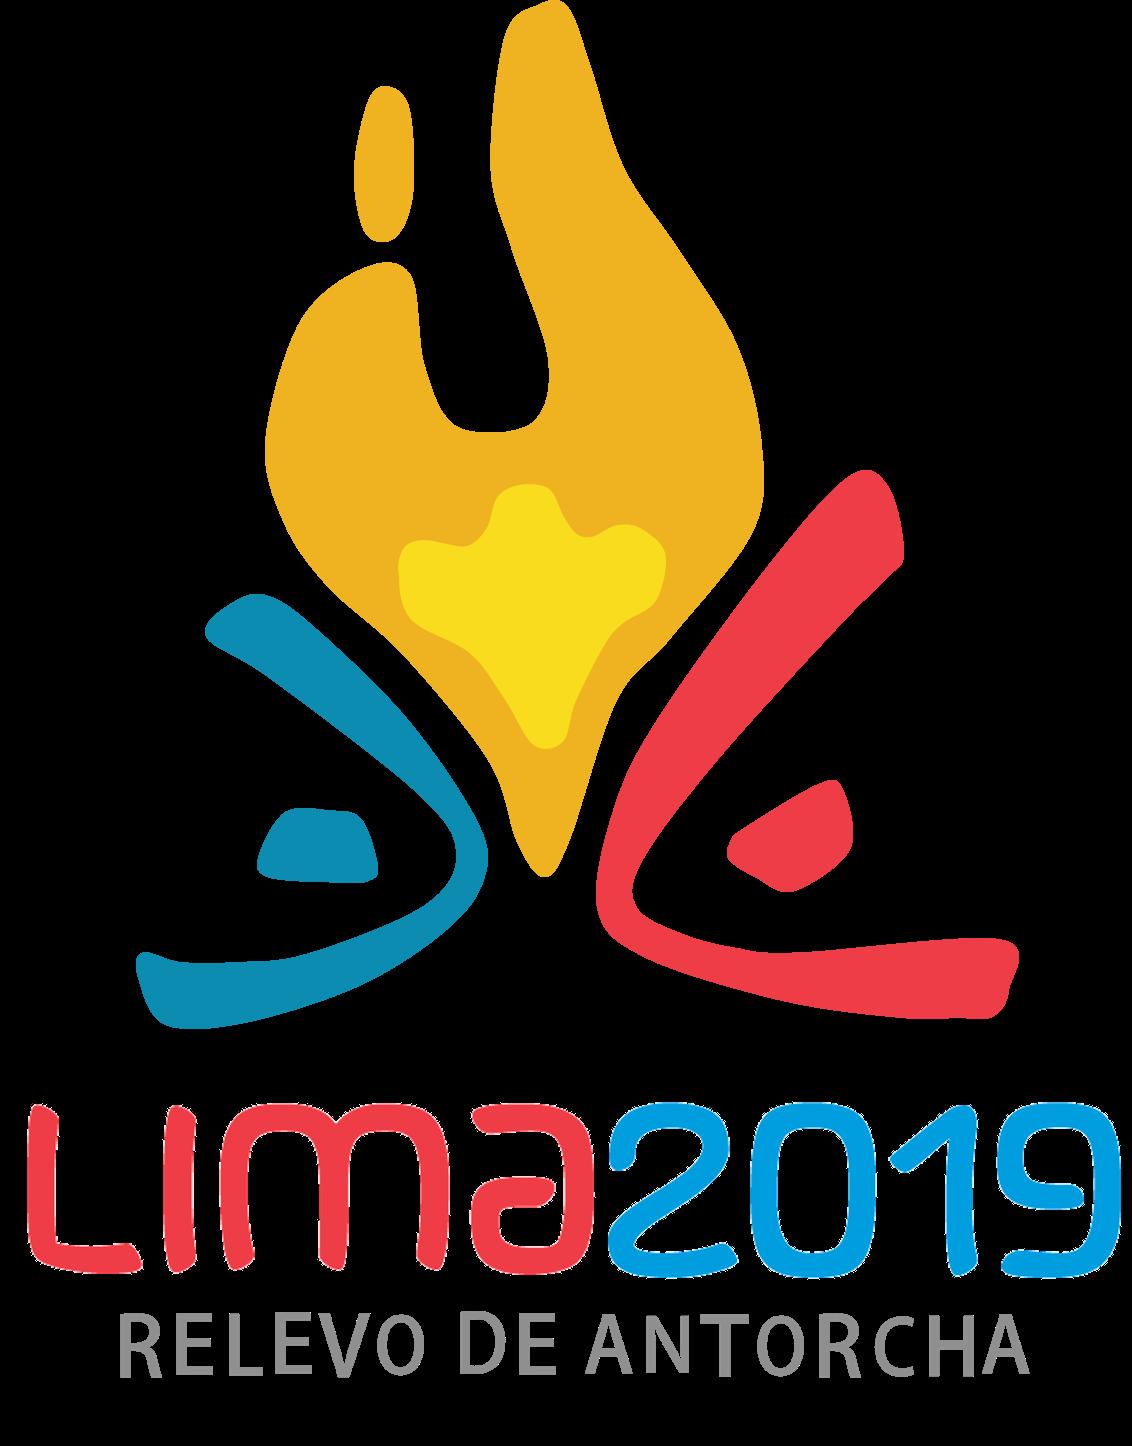 File:Logotipo del Relevo de Antorcha Lima 2019.png.